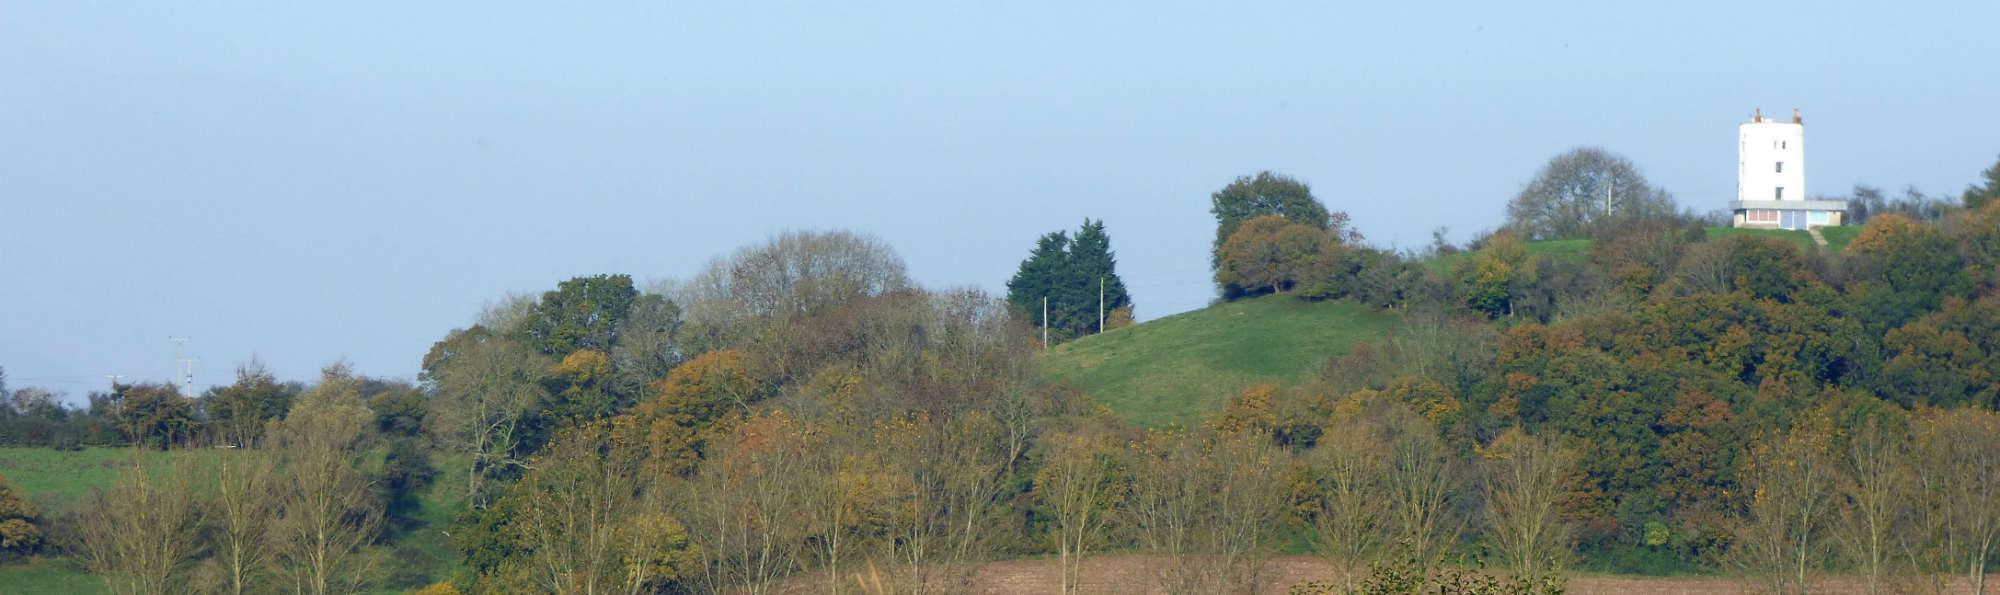 wide image of Walton windmill